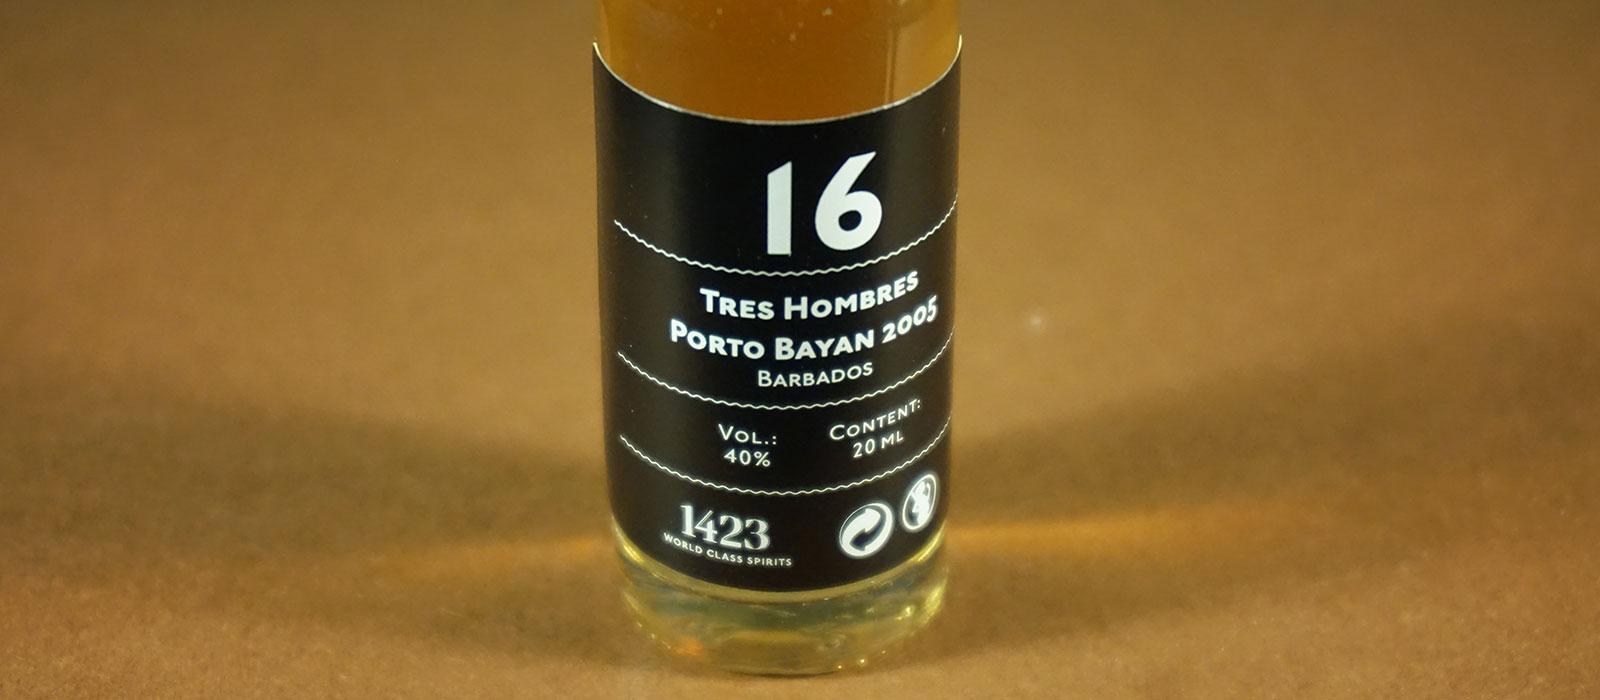 24 Days of Rum 2017: Dag 16 – Tres Hombres Porto Bayan 2005